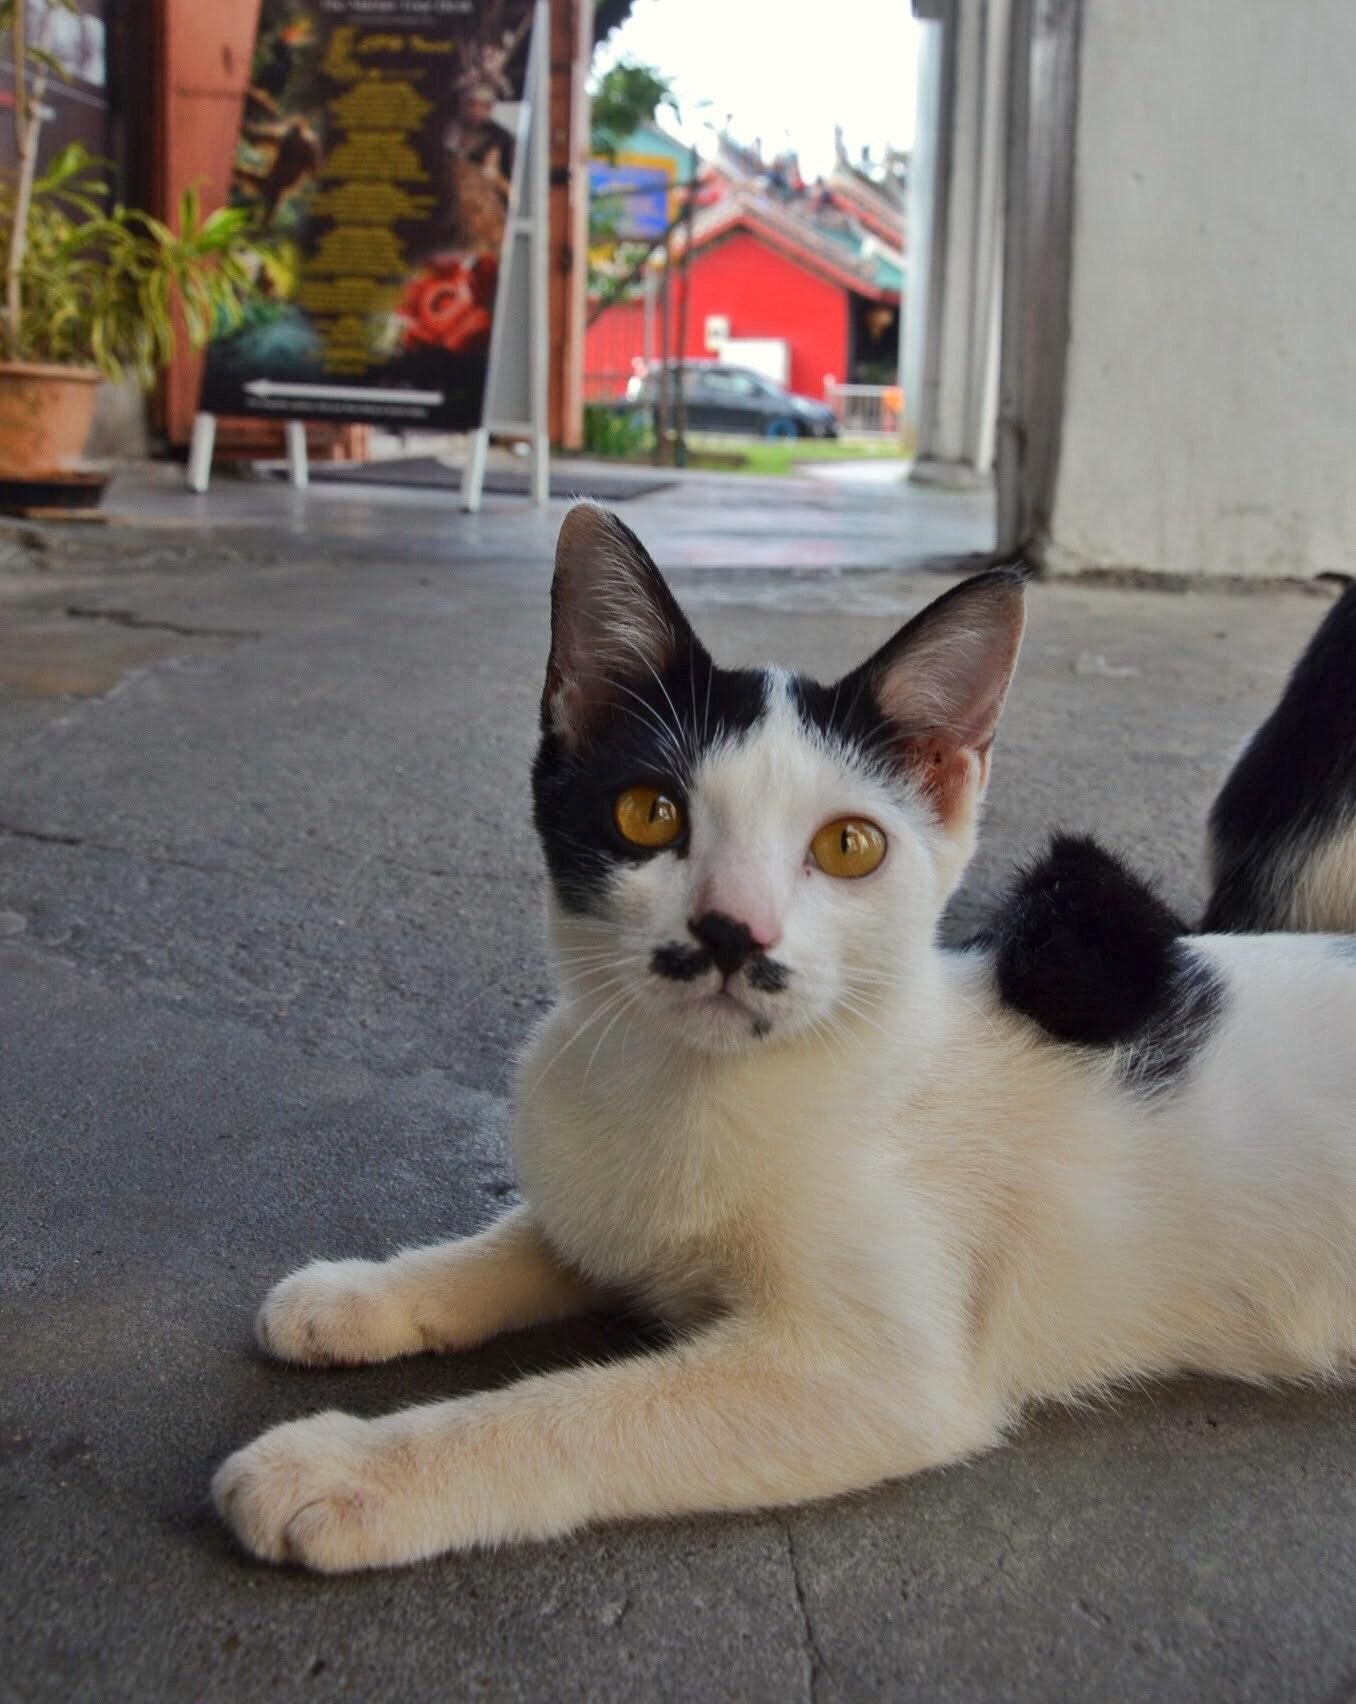 Free stock photo of cat meow kitty catchallenge kuching